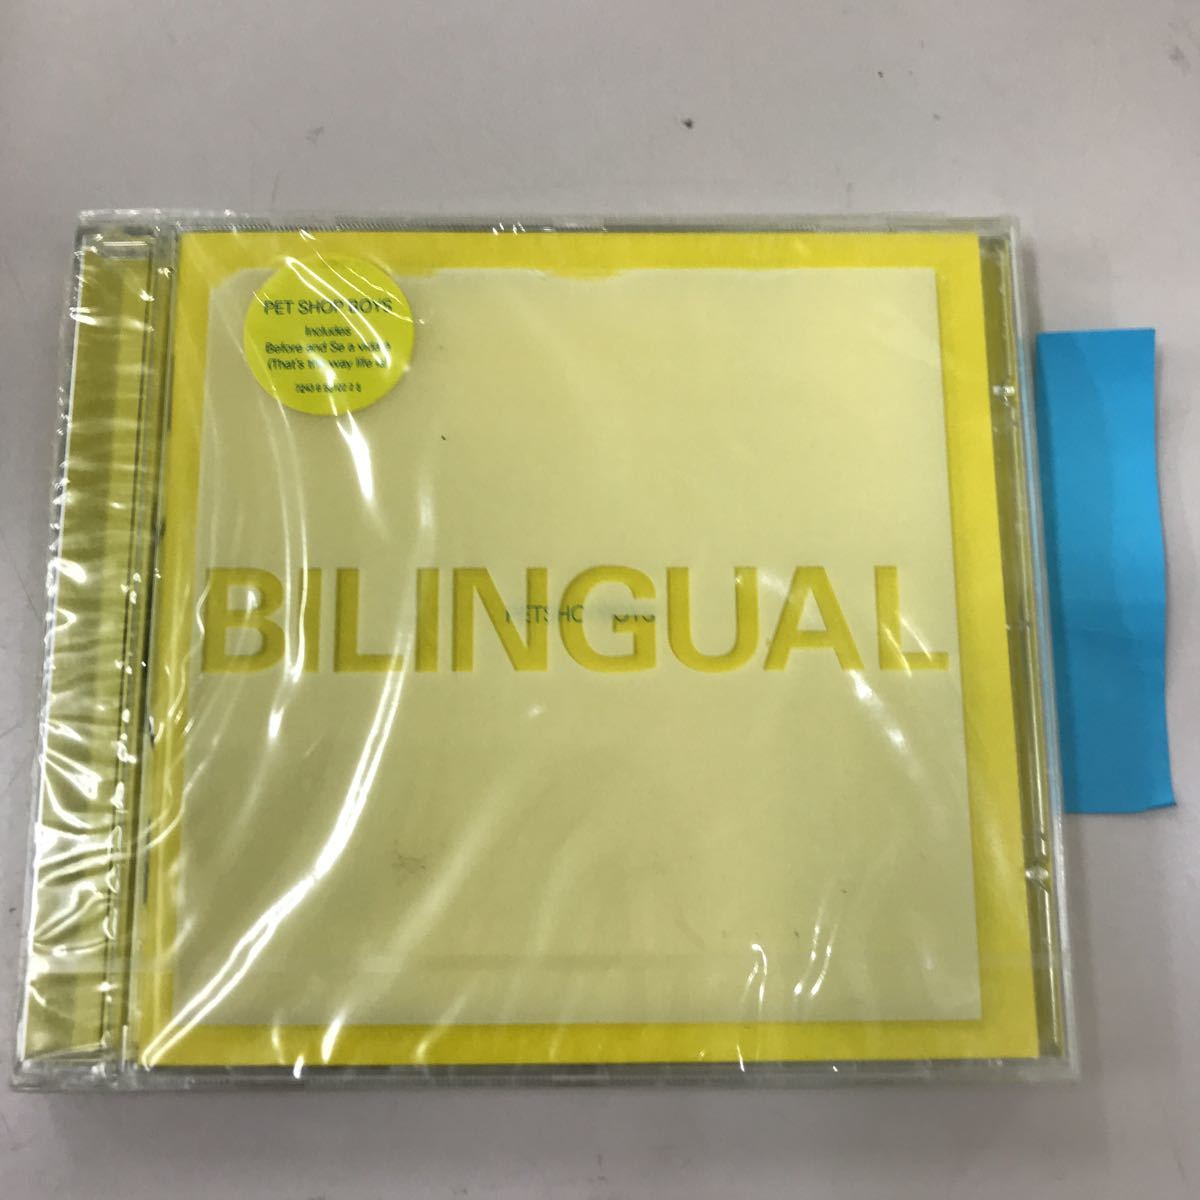 CD 輸入盤未開封【洋楽】長期保存品 BILINGUAL